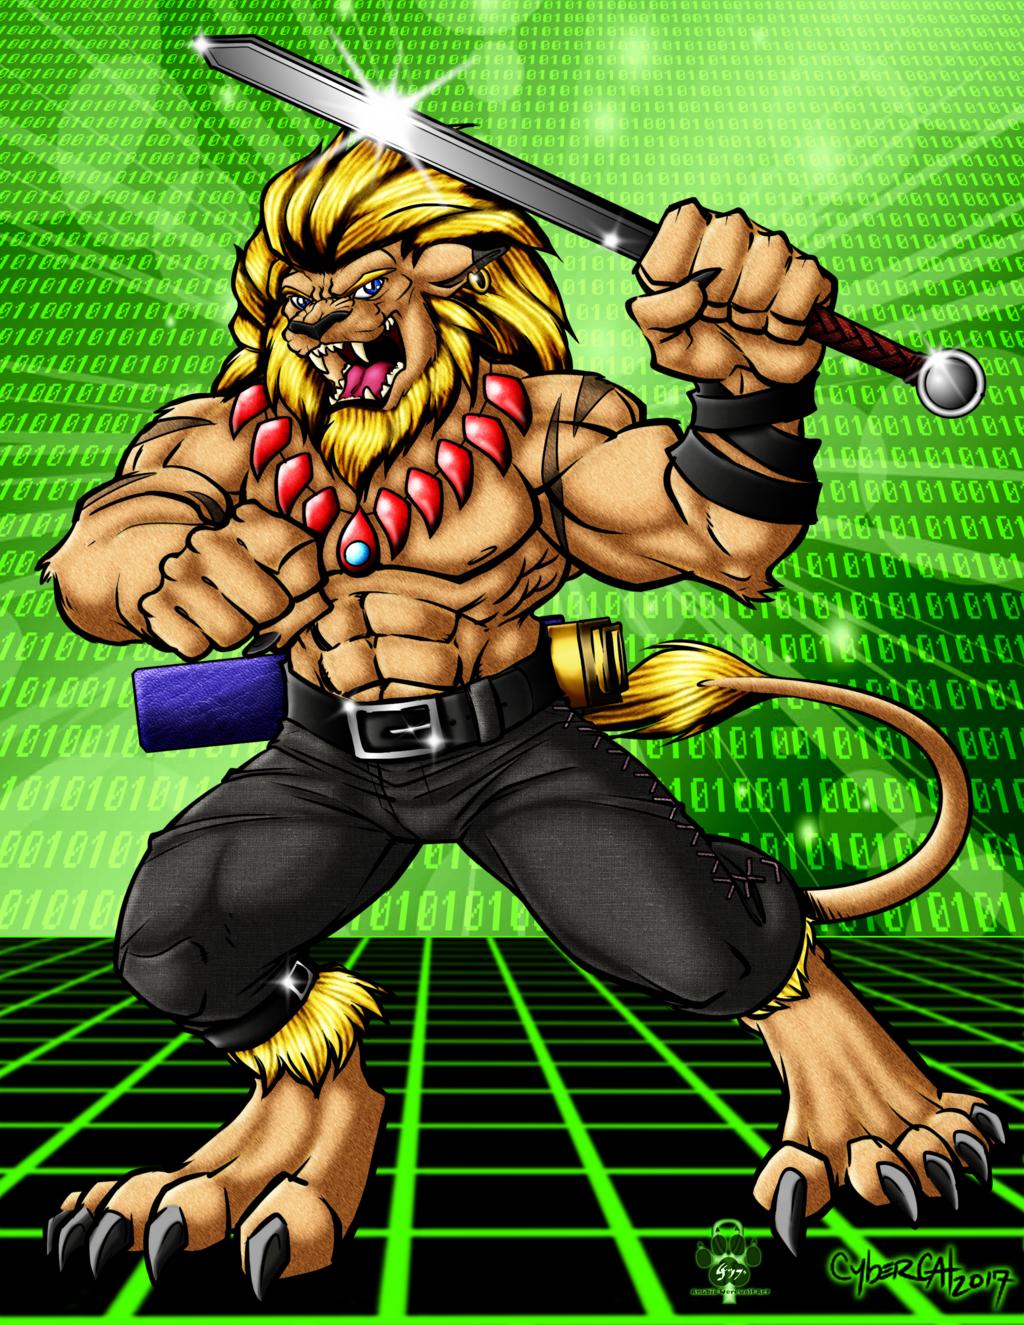 The Digital Warrior